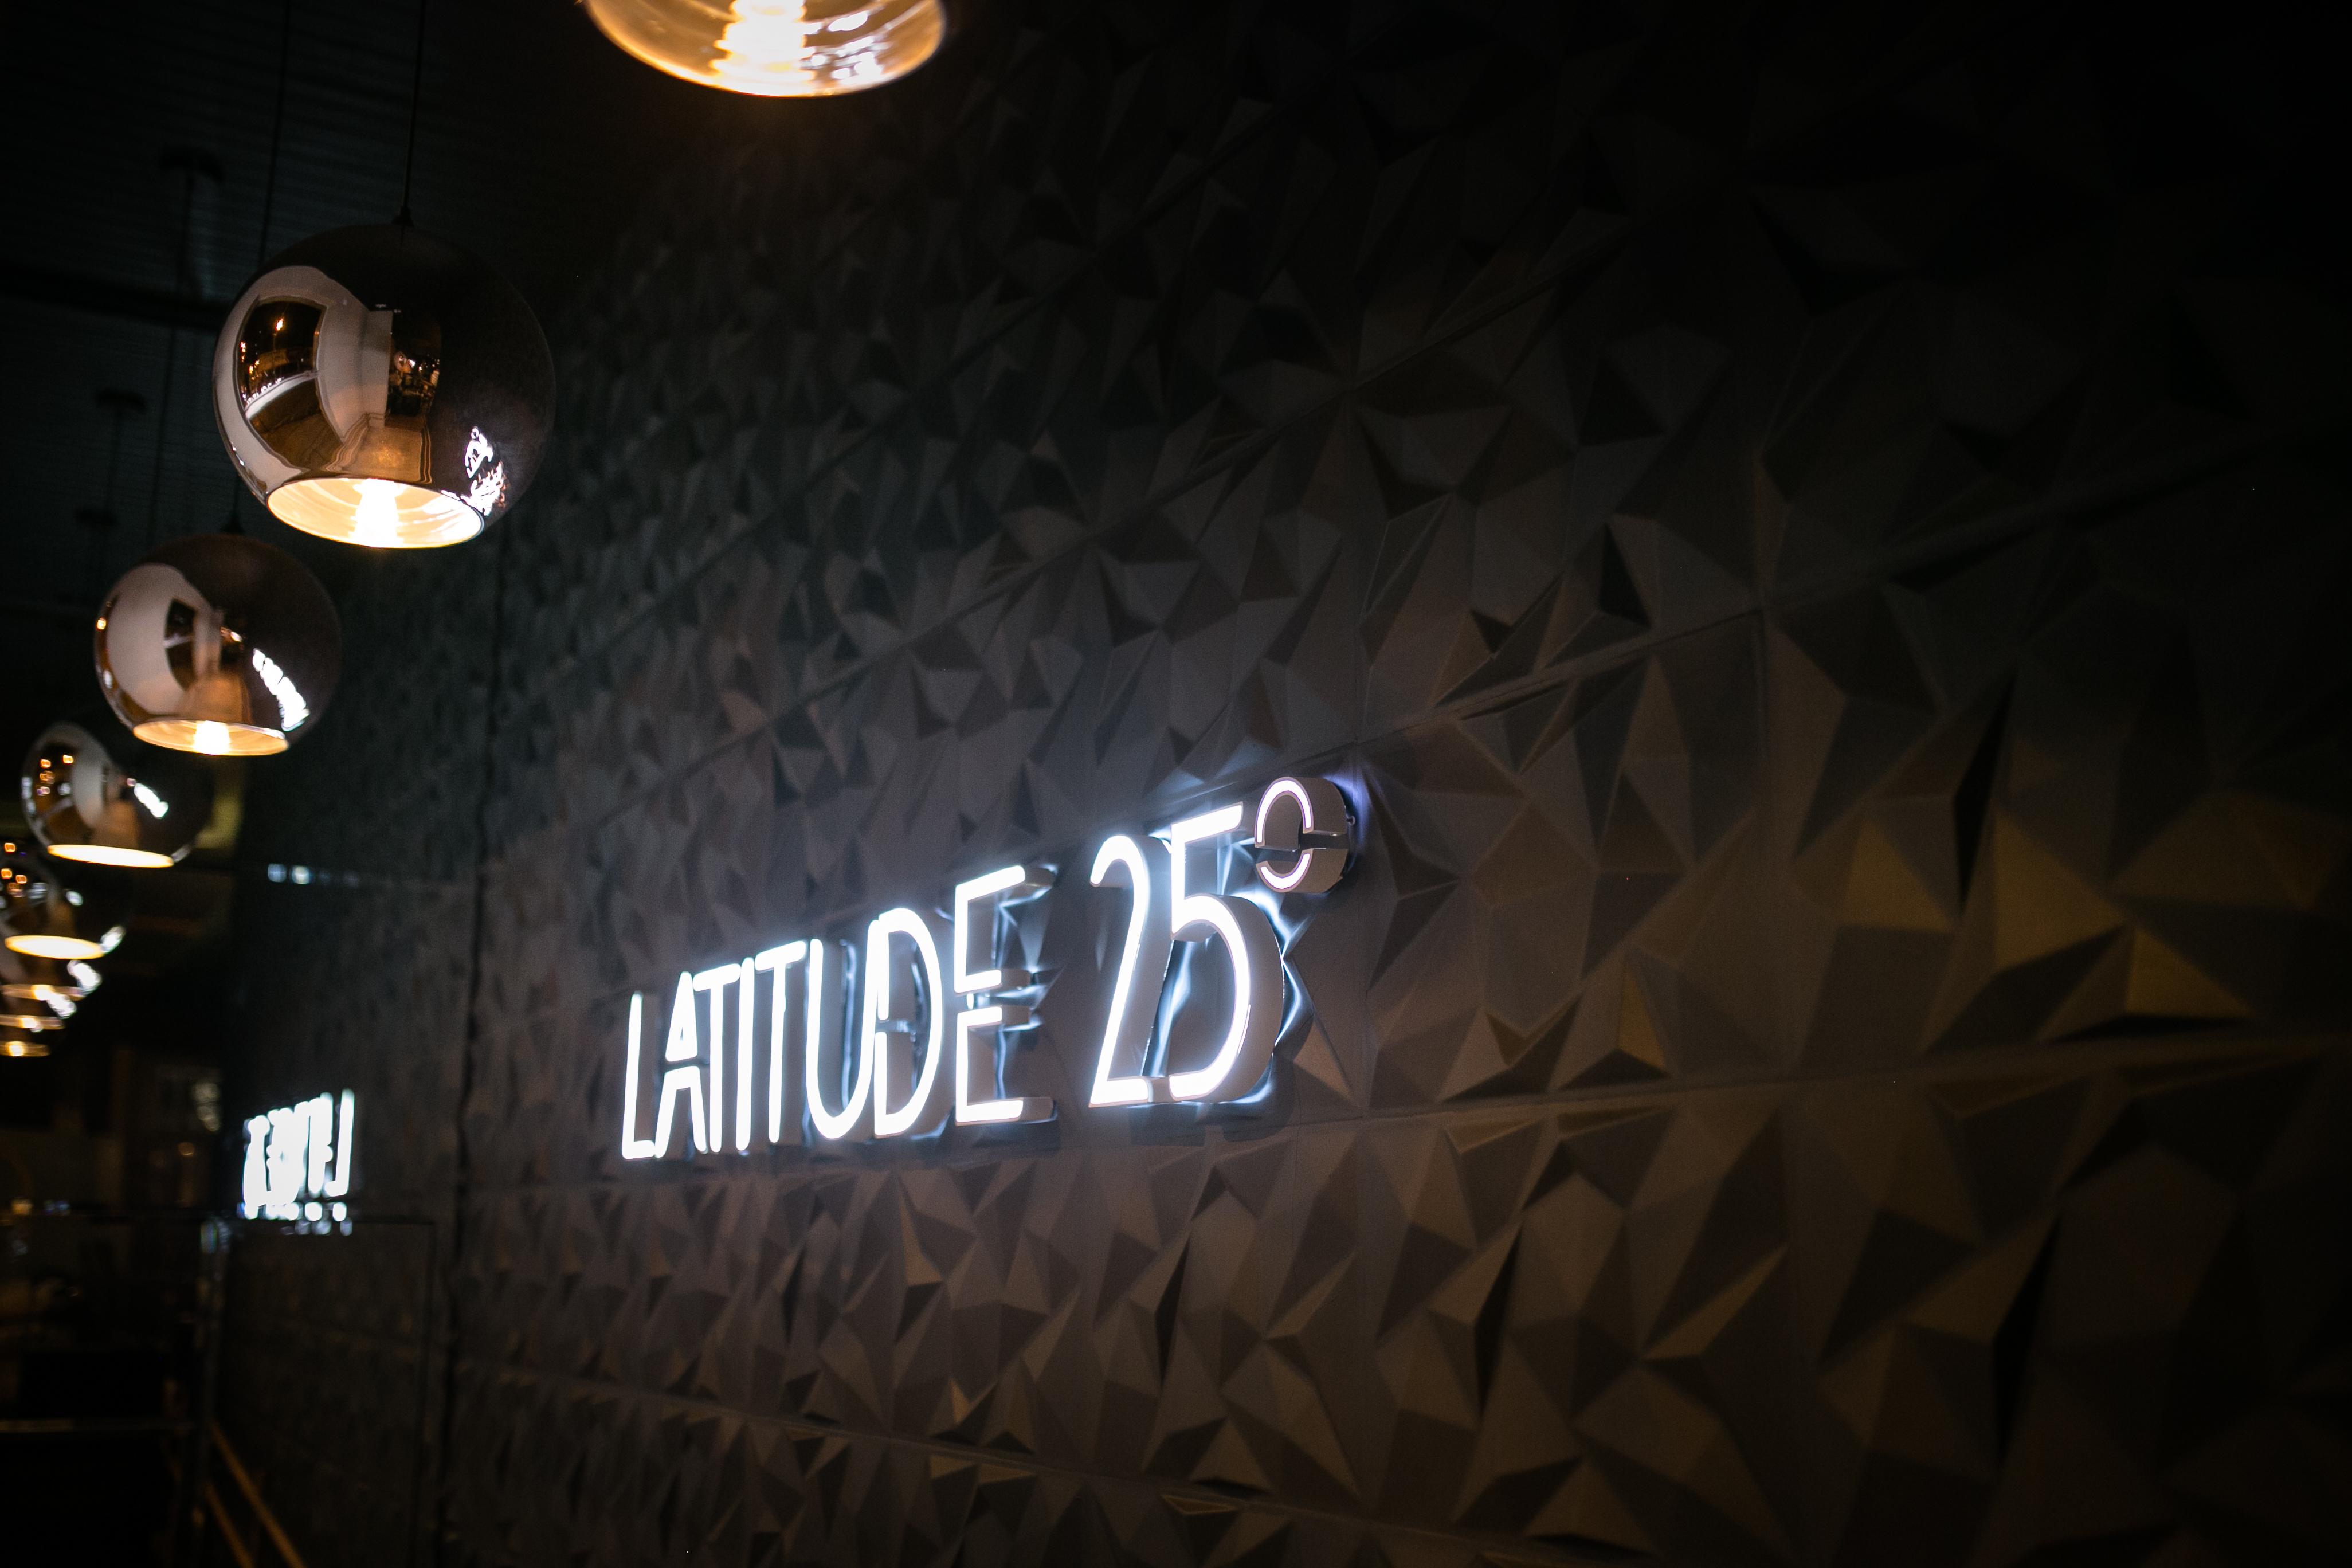 Entrada - Latitude 25